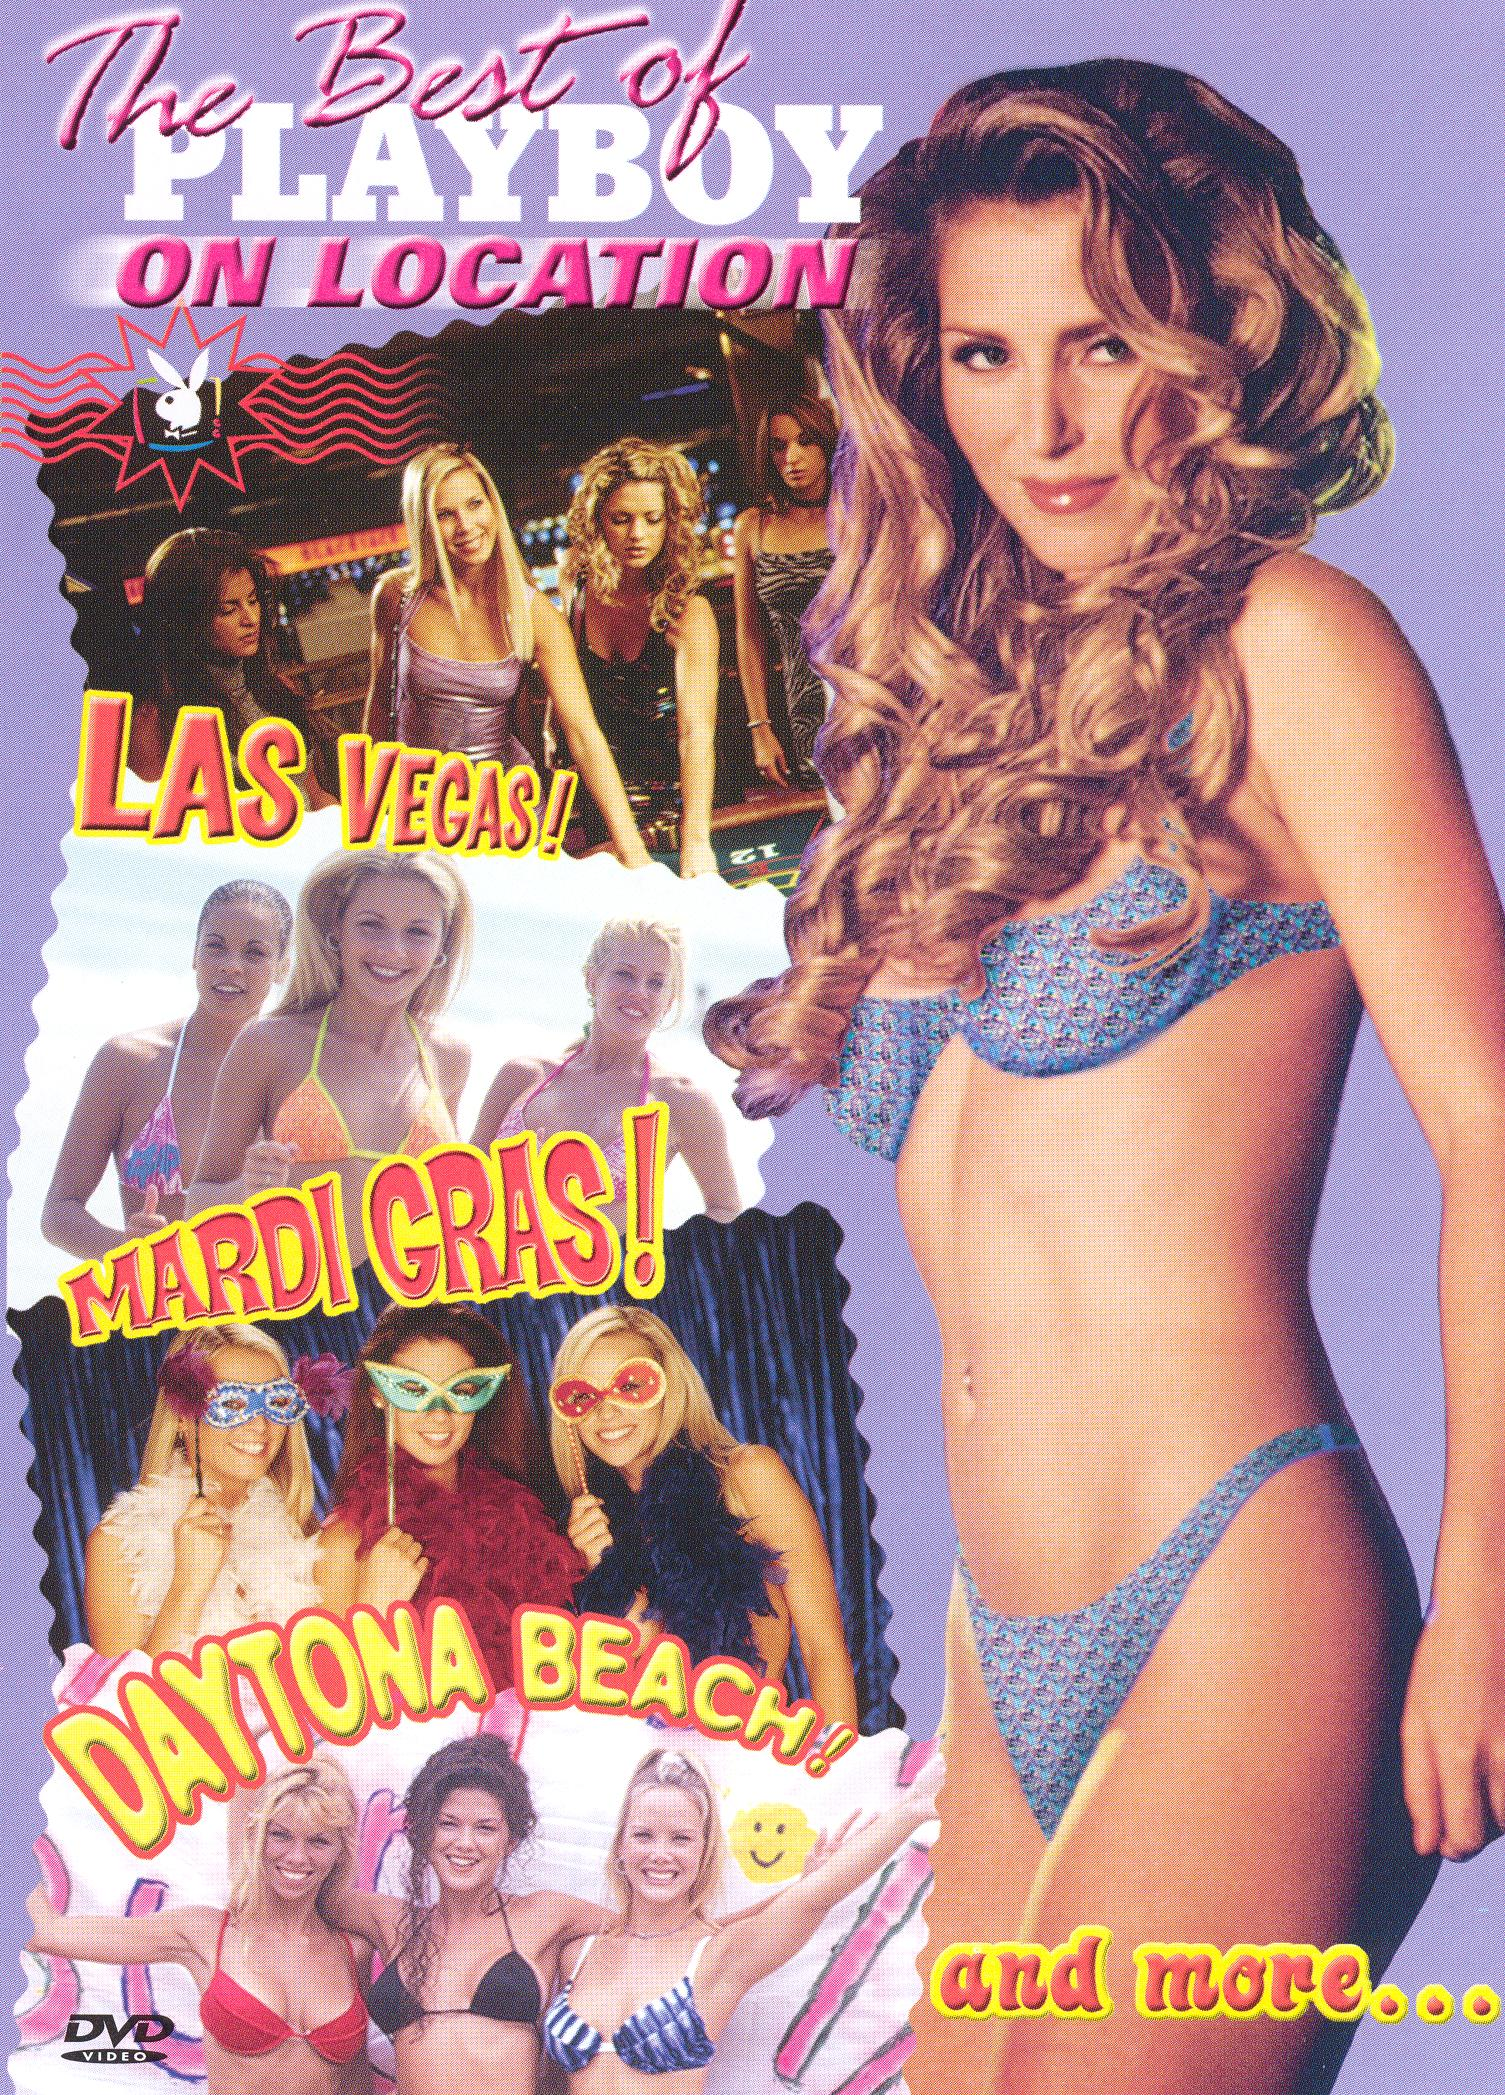 Playboy TV: Best of Playboy on Location